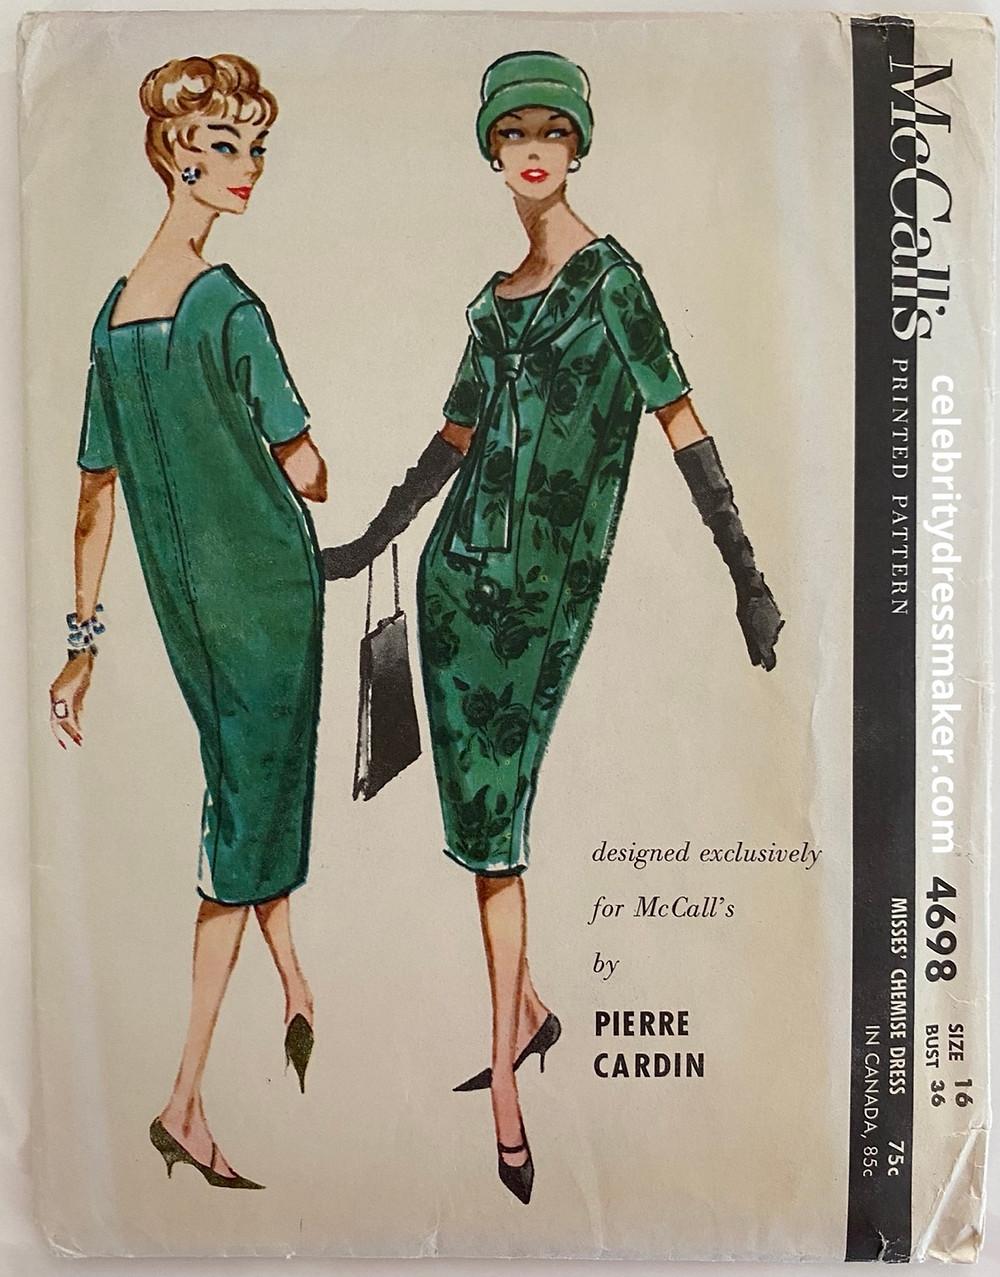 McCall's #4698 pattern Design by Pierre Cardin 1958